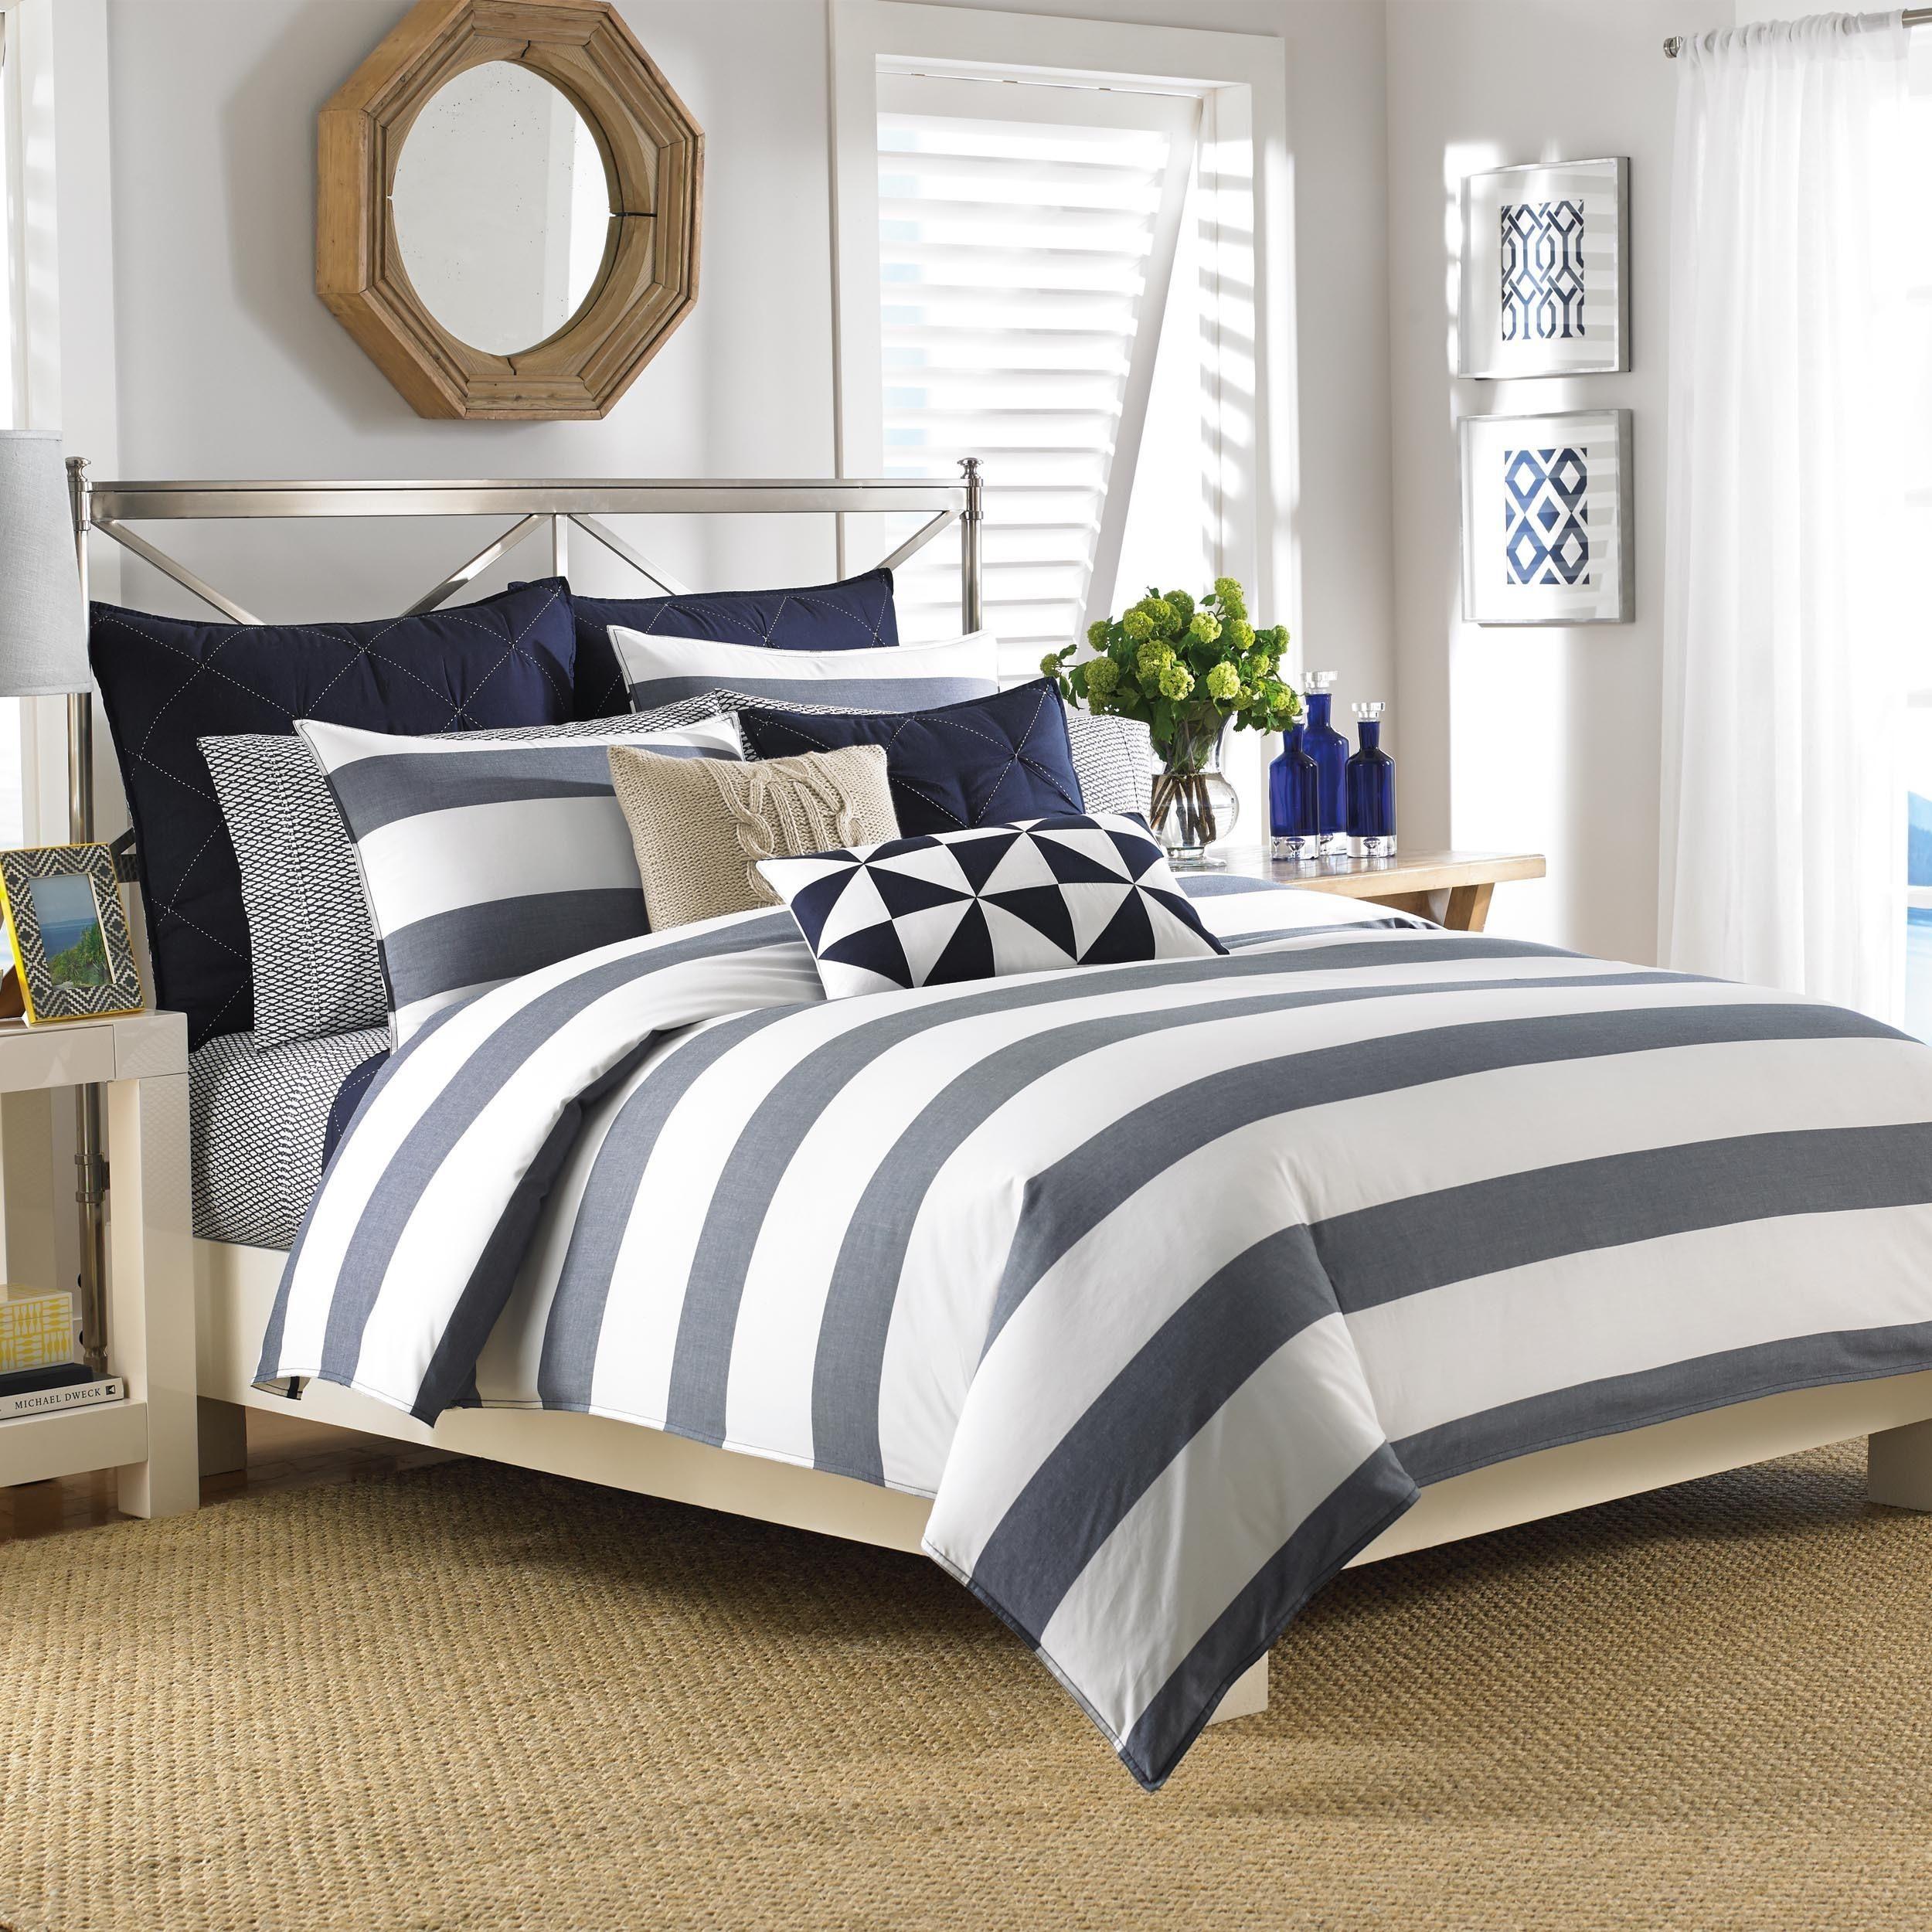 comforters bedroom duvet comforter for room linen blue bed cotton set spring king cozy navy colorful